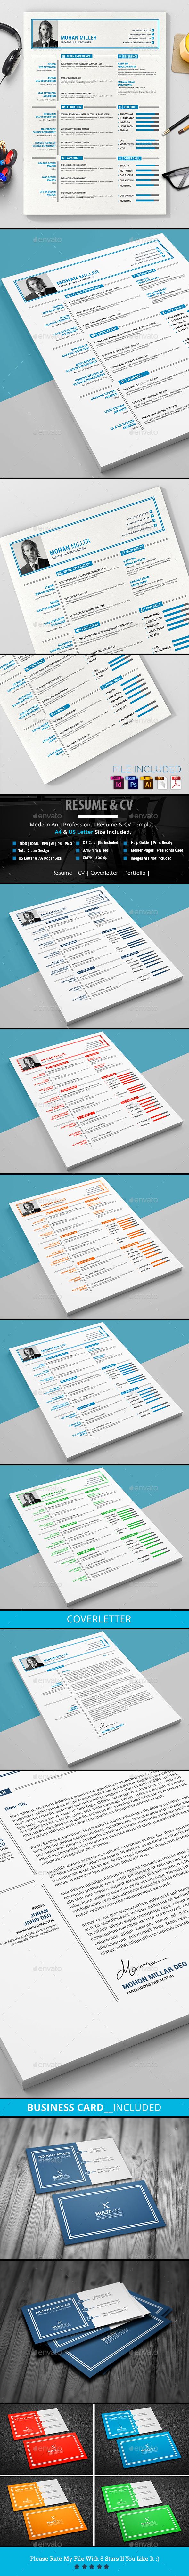 Clean Resume/CV - Resumes Stationery